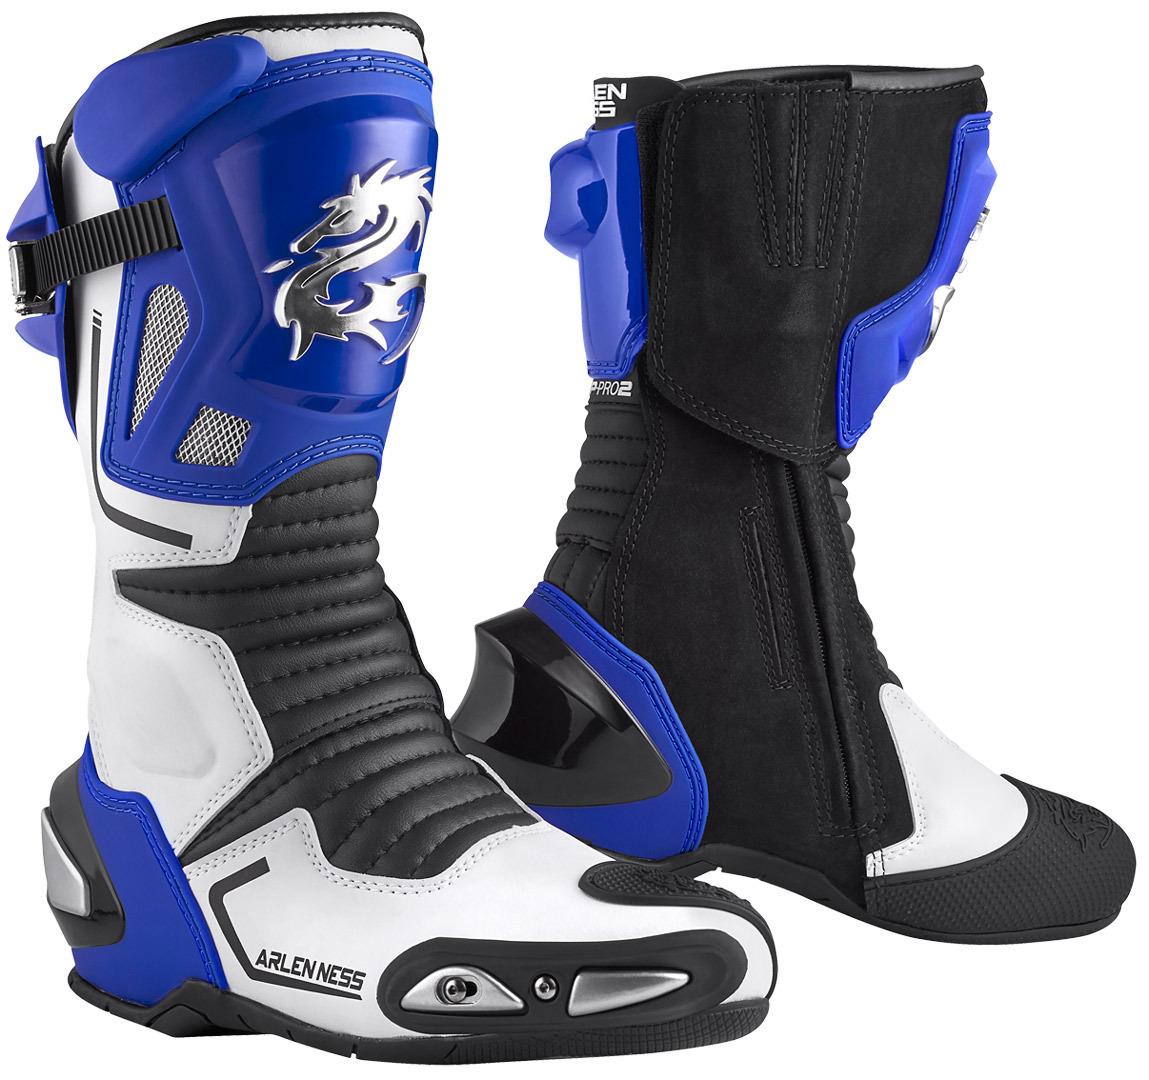 Arlen Ness Sugello Motorradstiefel, schwarz-weiss-blau, Größe 42, schwarz-weiss-blau, Größe 42